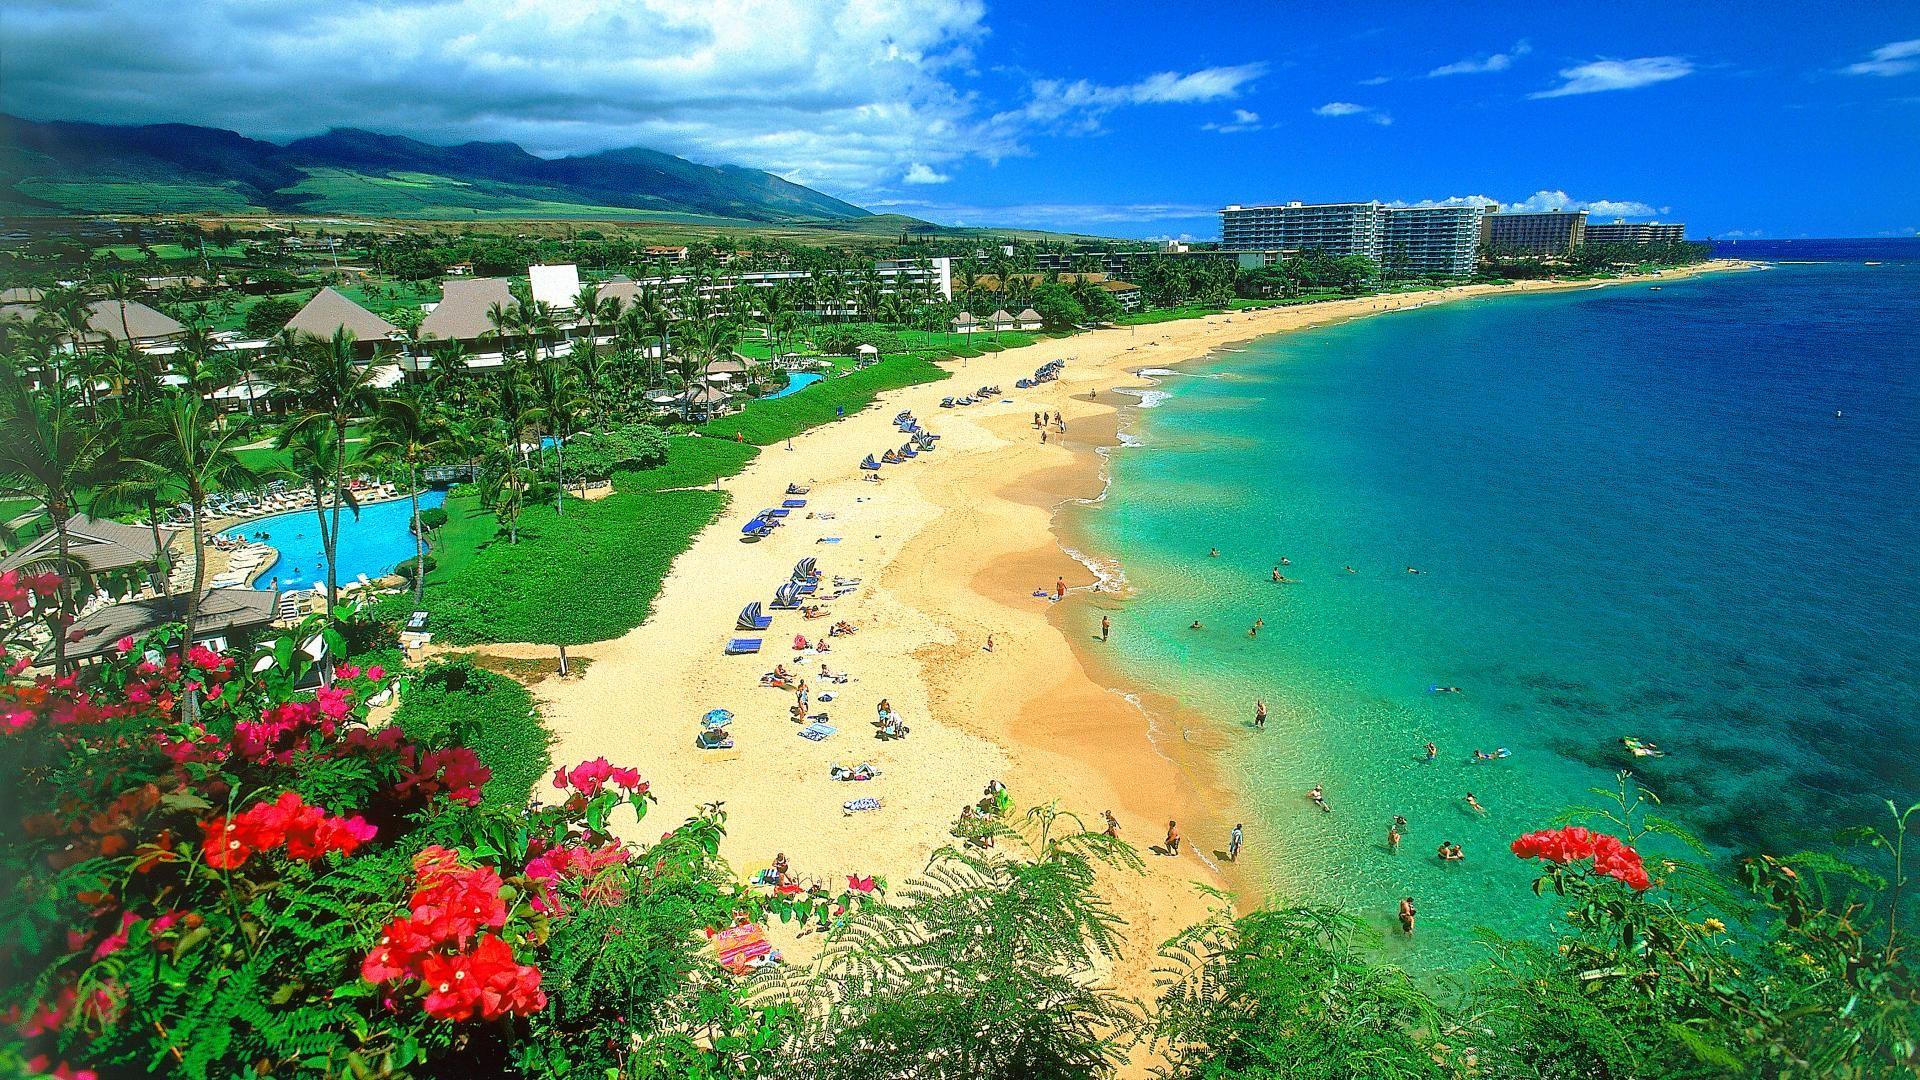 Full Hd 1080p Hawaii Wallpapers Hd Desktop Backgrounds 1920x1080